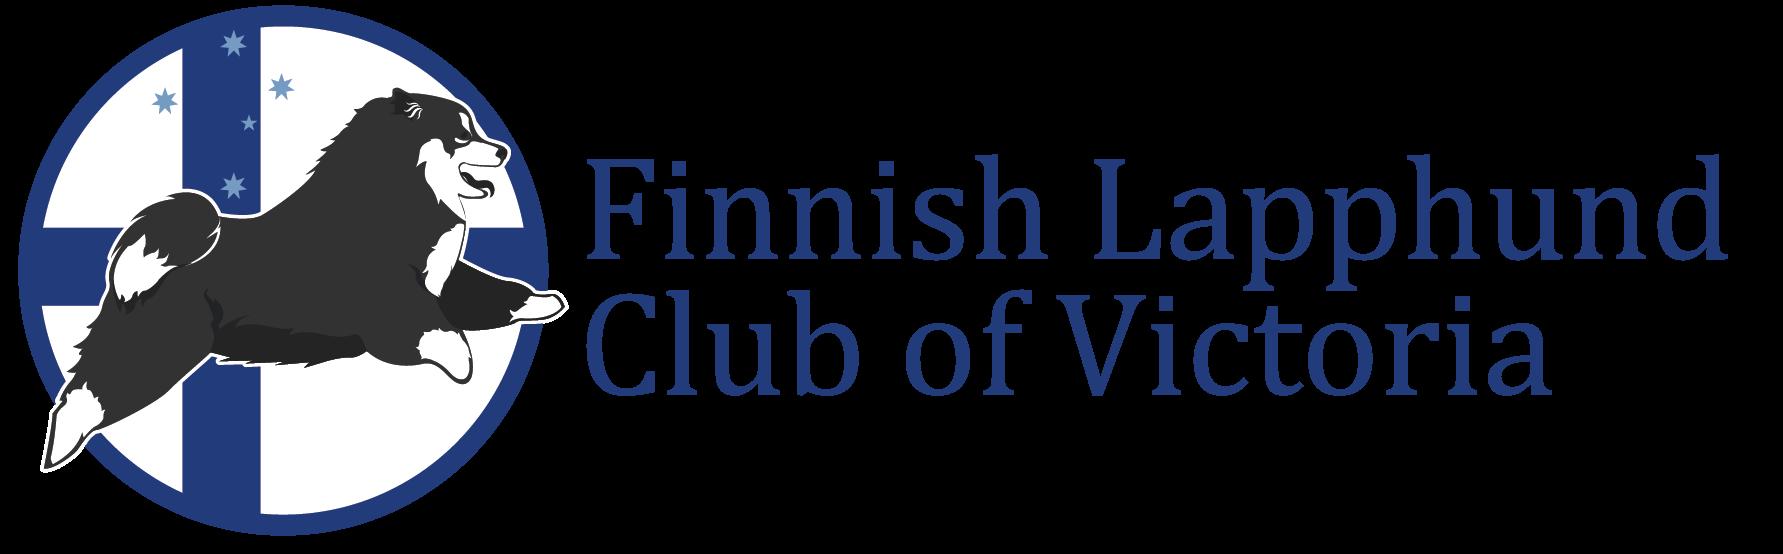 Finnish Lapphund Club of Victoria